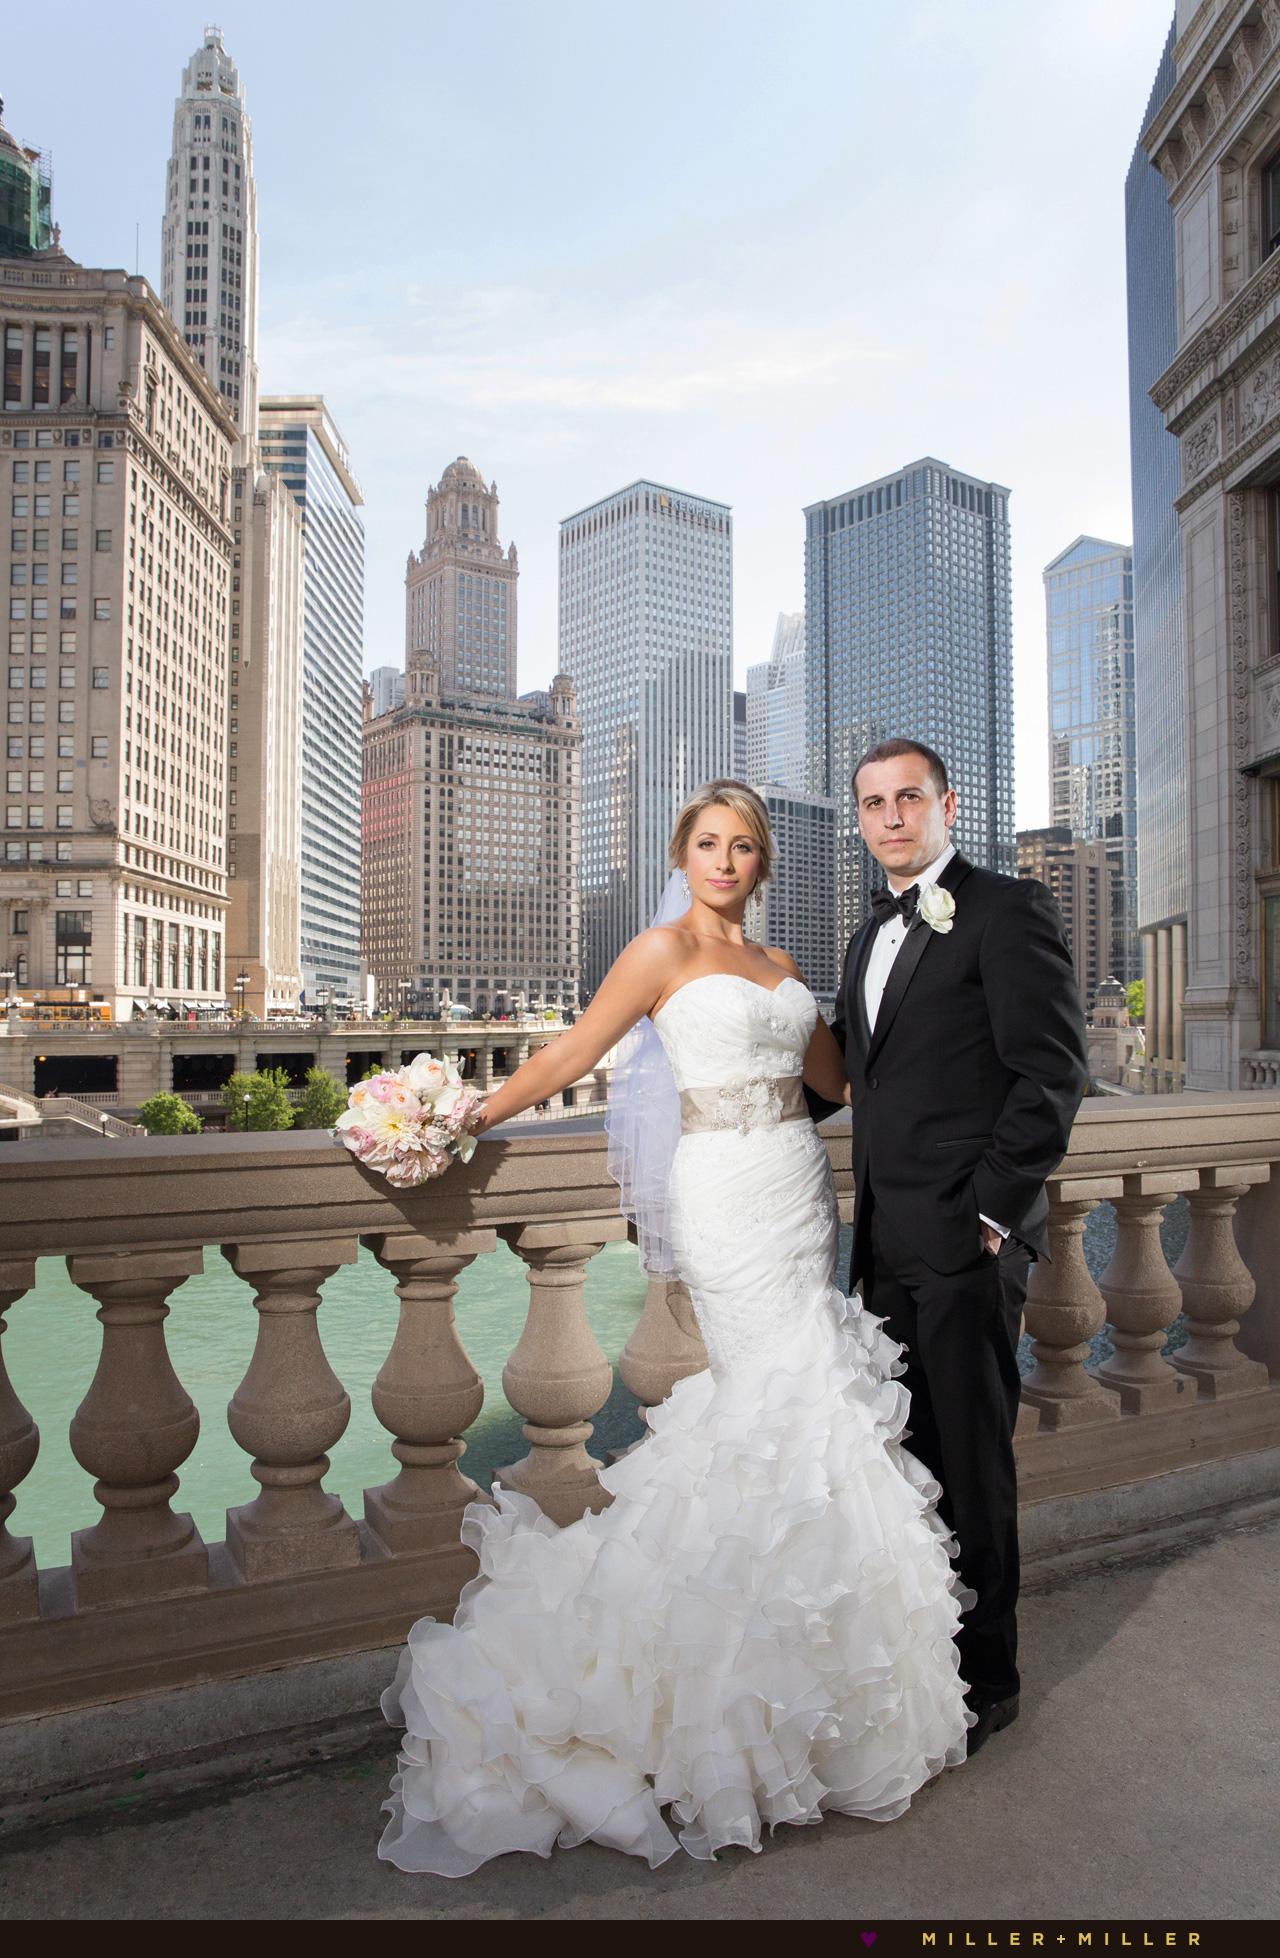 Waldorf Astoria Chicago Hotel Wedding Archives Chicago Wedding Photographers